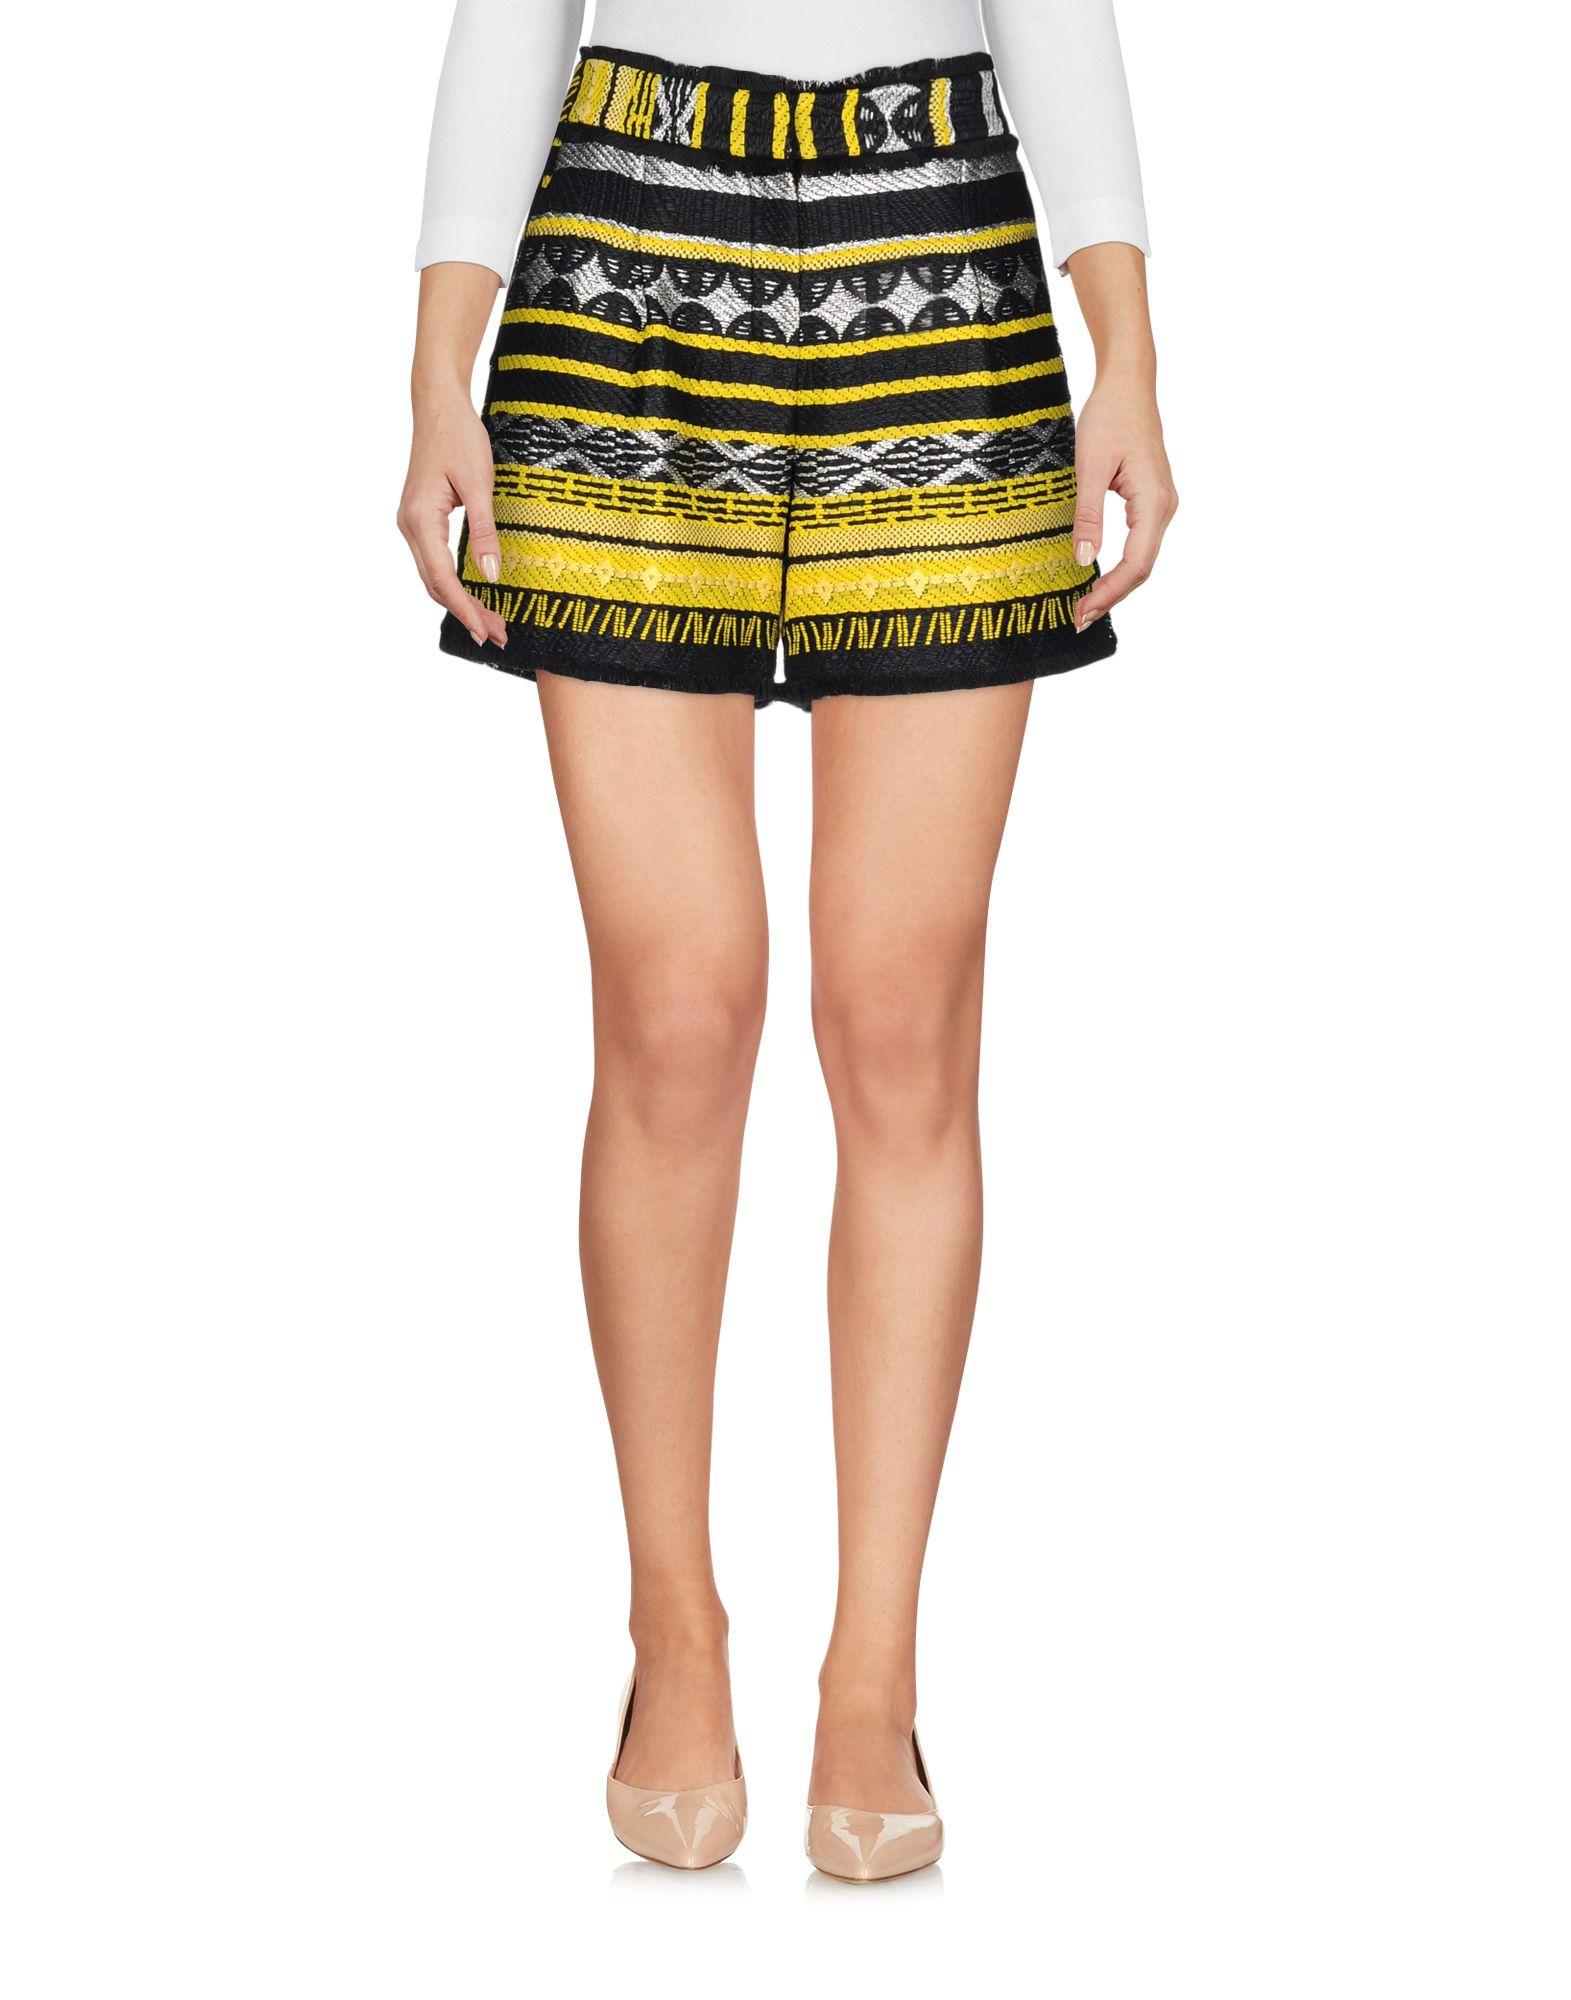 SIMONA CORSELLINI Damen Shorts Farbe Gelb Größe 5 - broschei